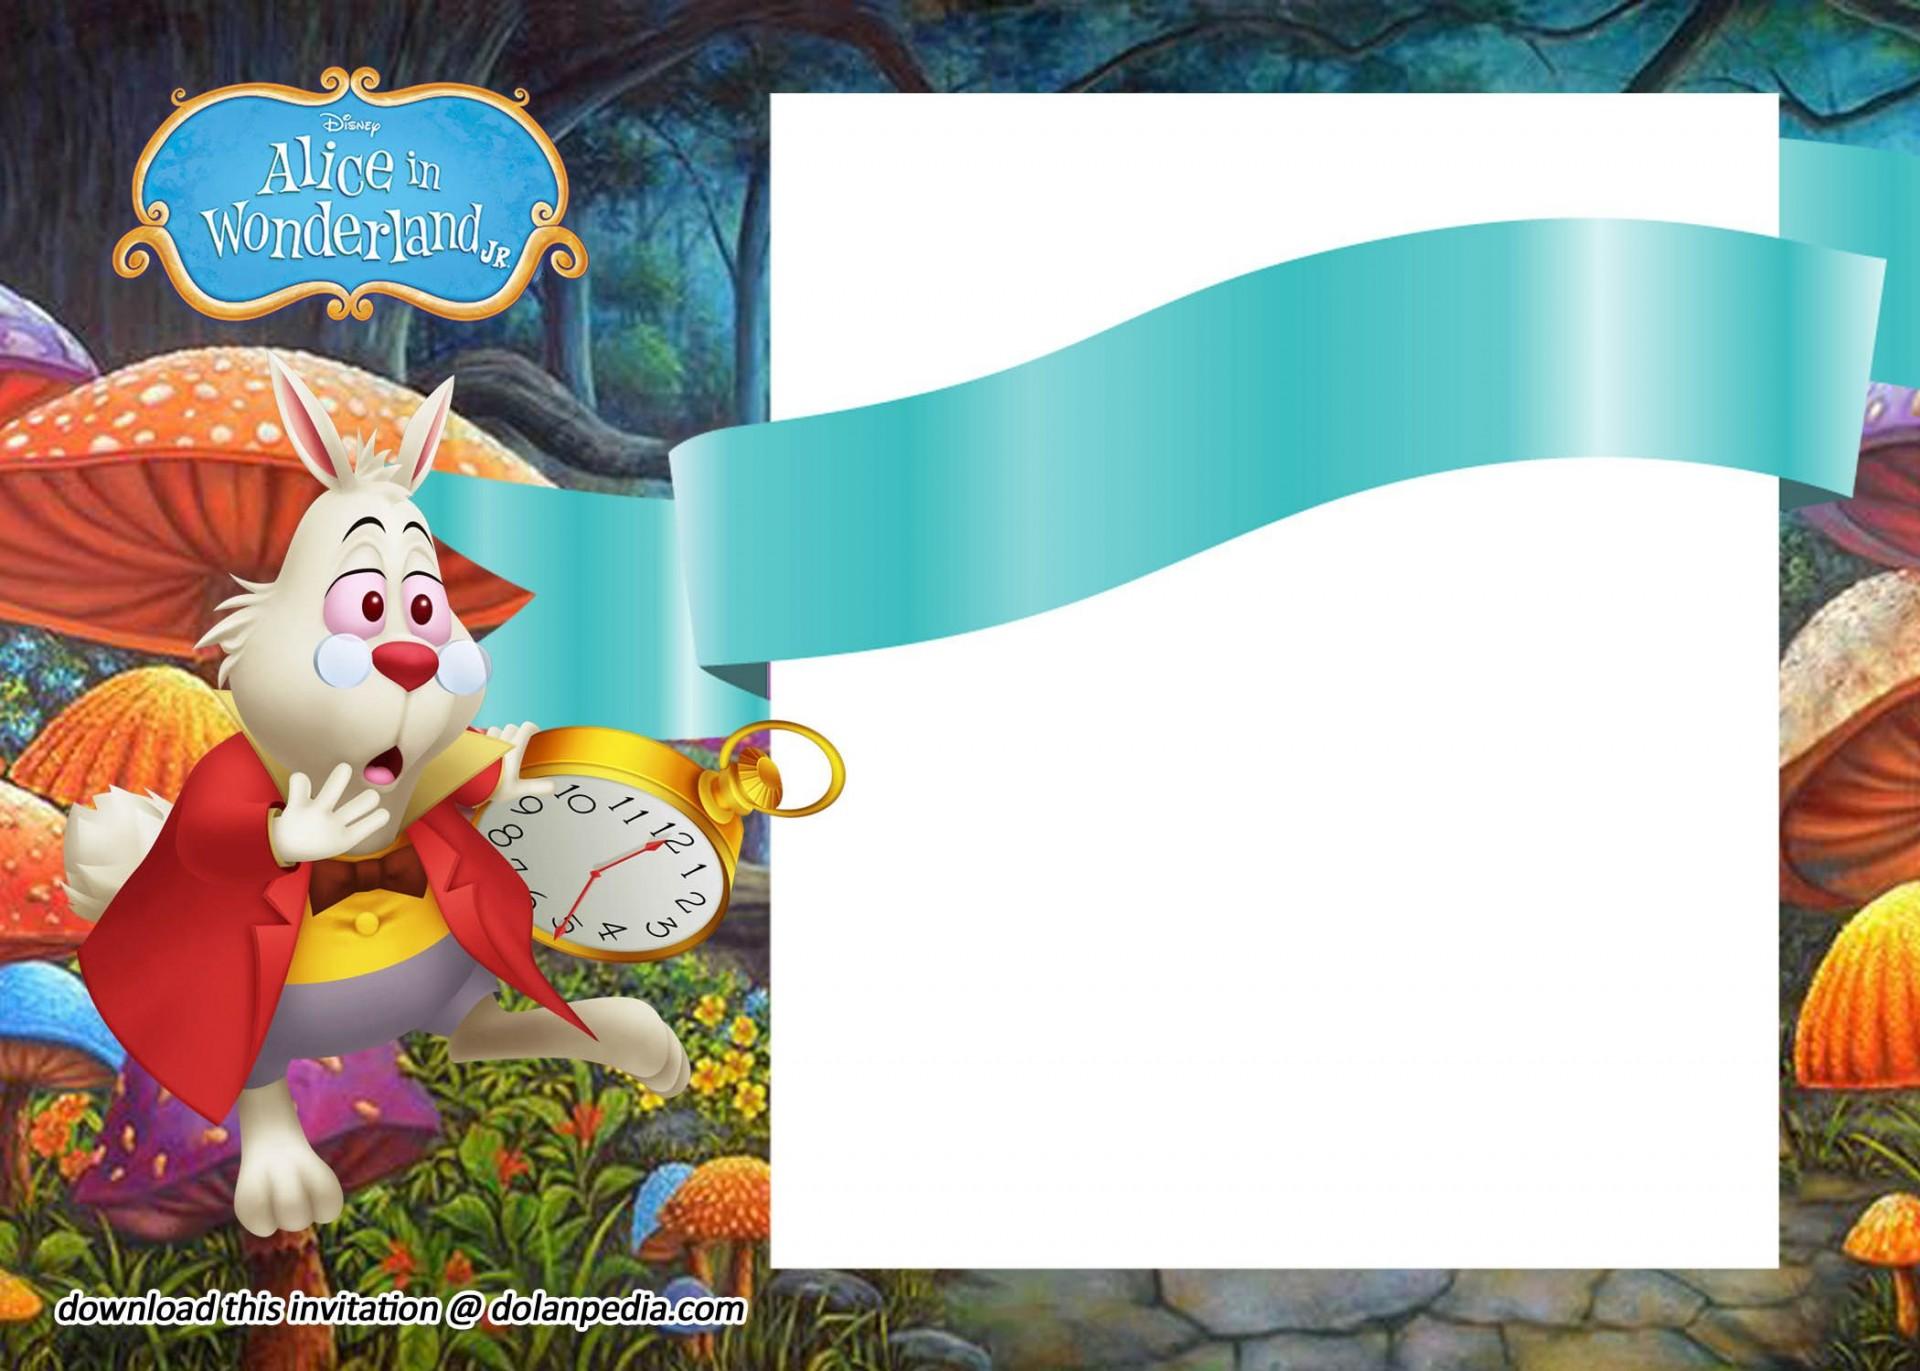 006 Striking Alice In Wonderland Tea Party Template High Def  Templates Invitation Free1920